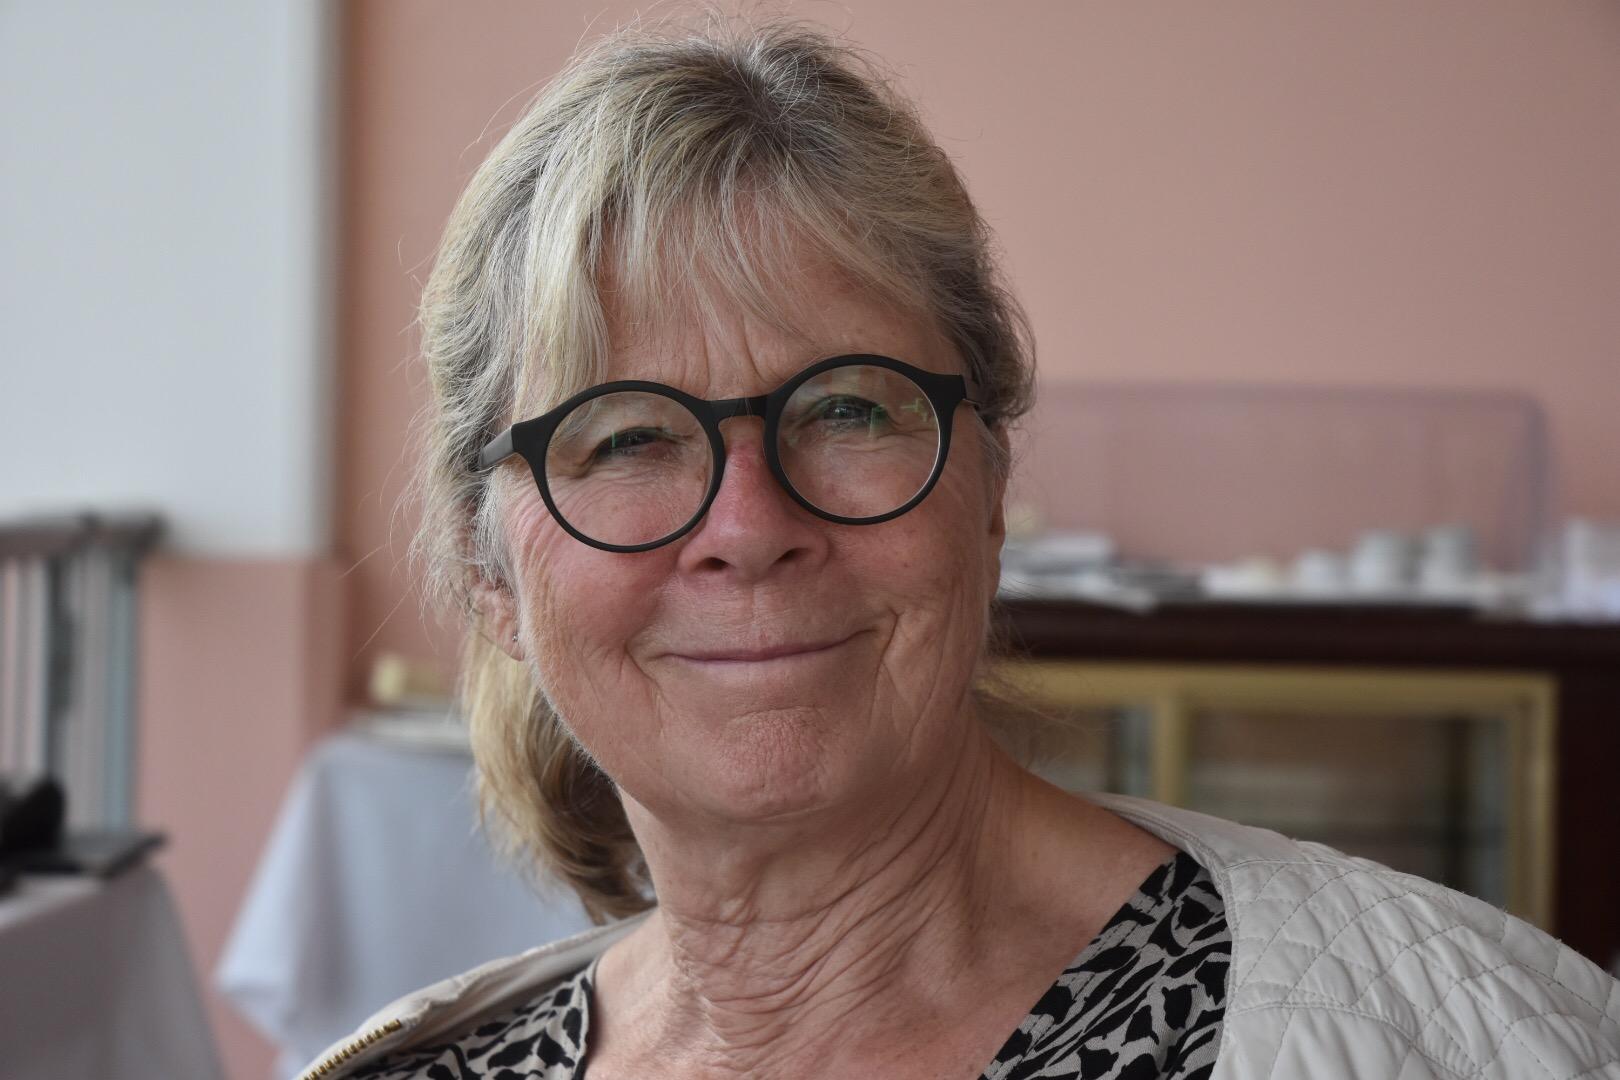 Babette Sonja Madvig